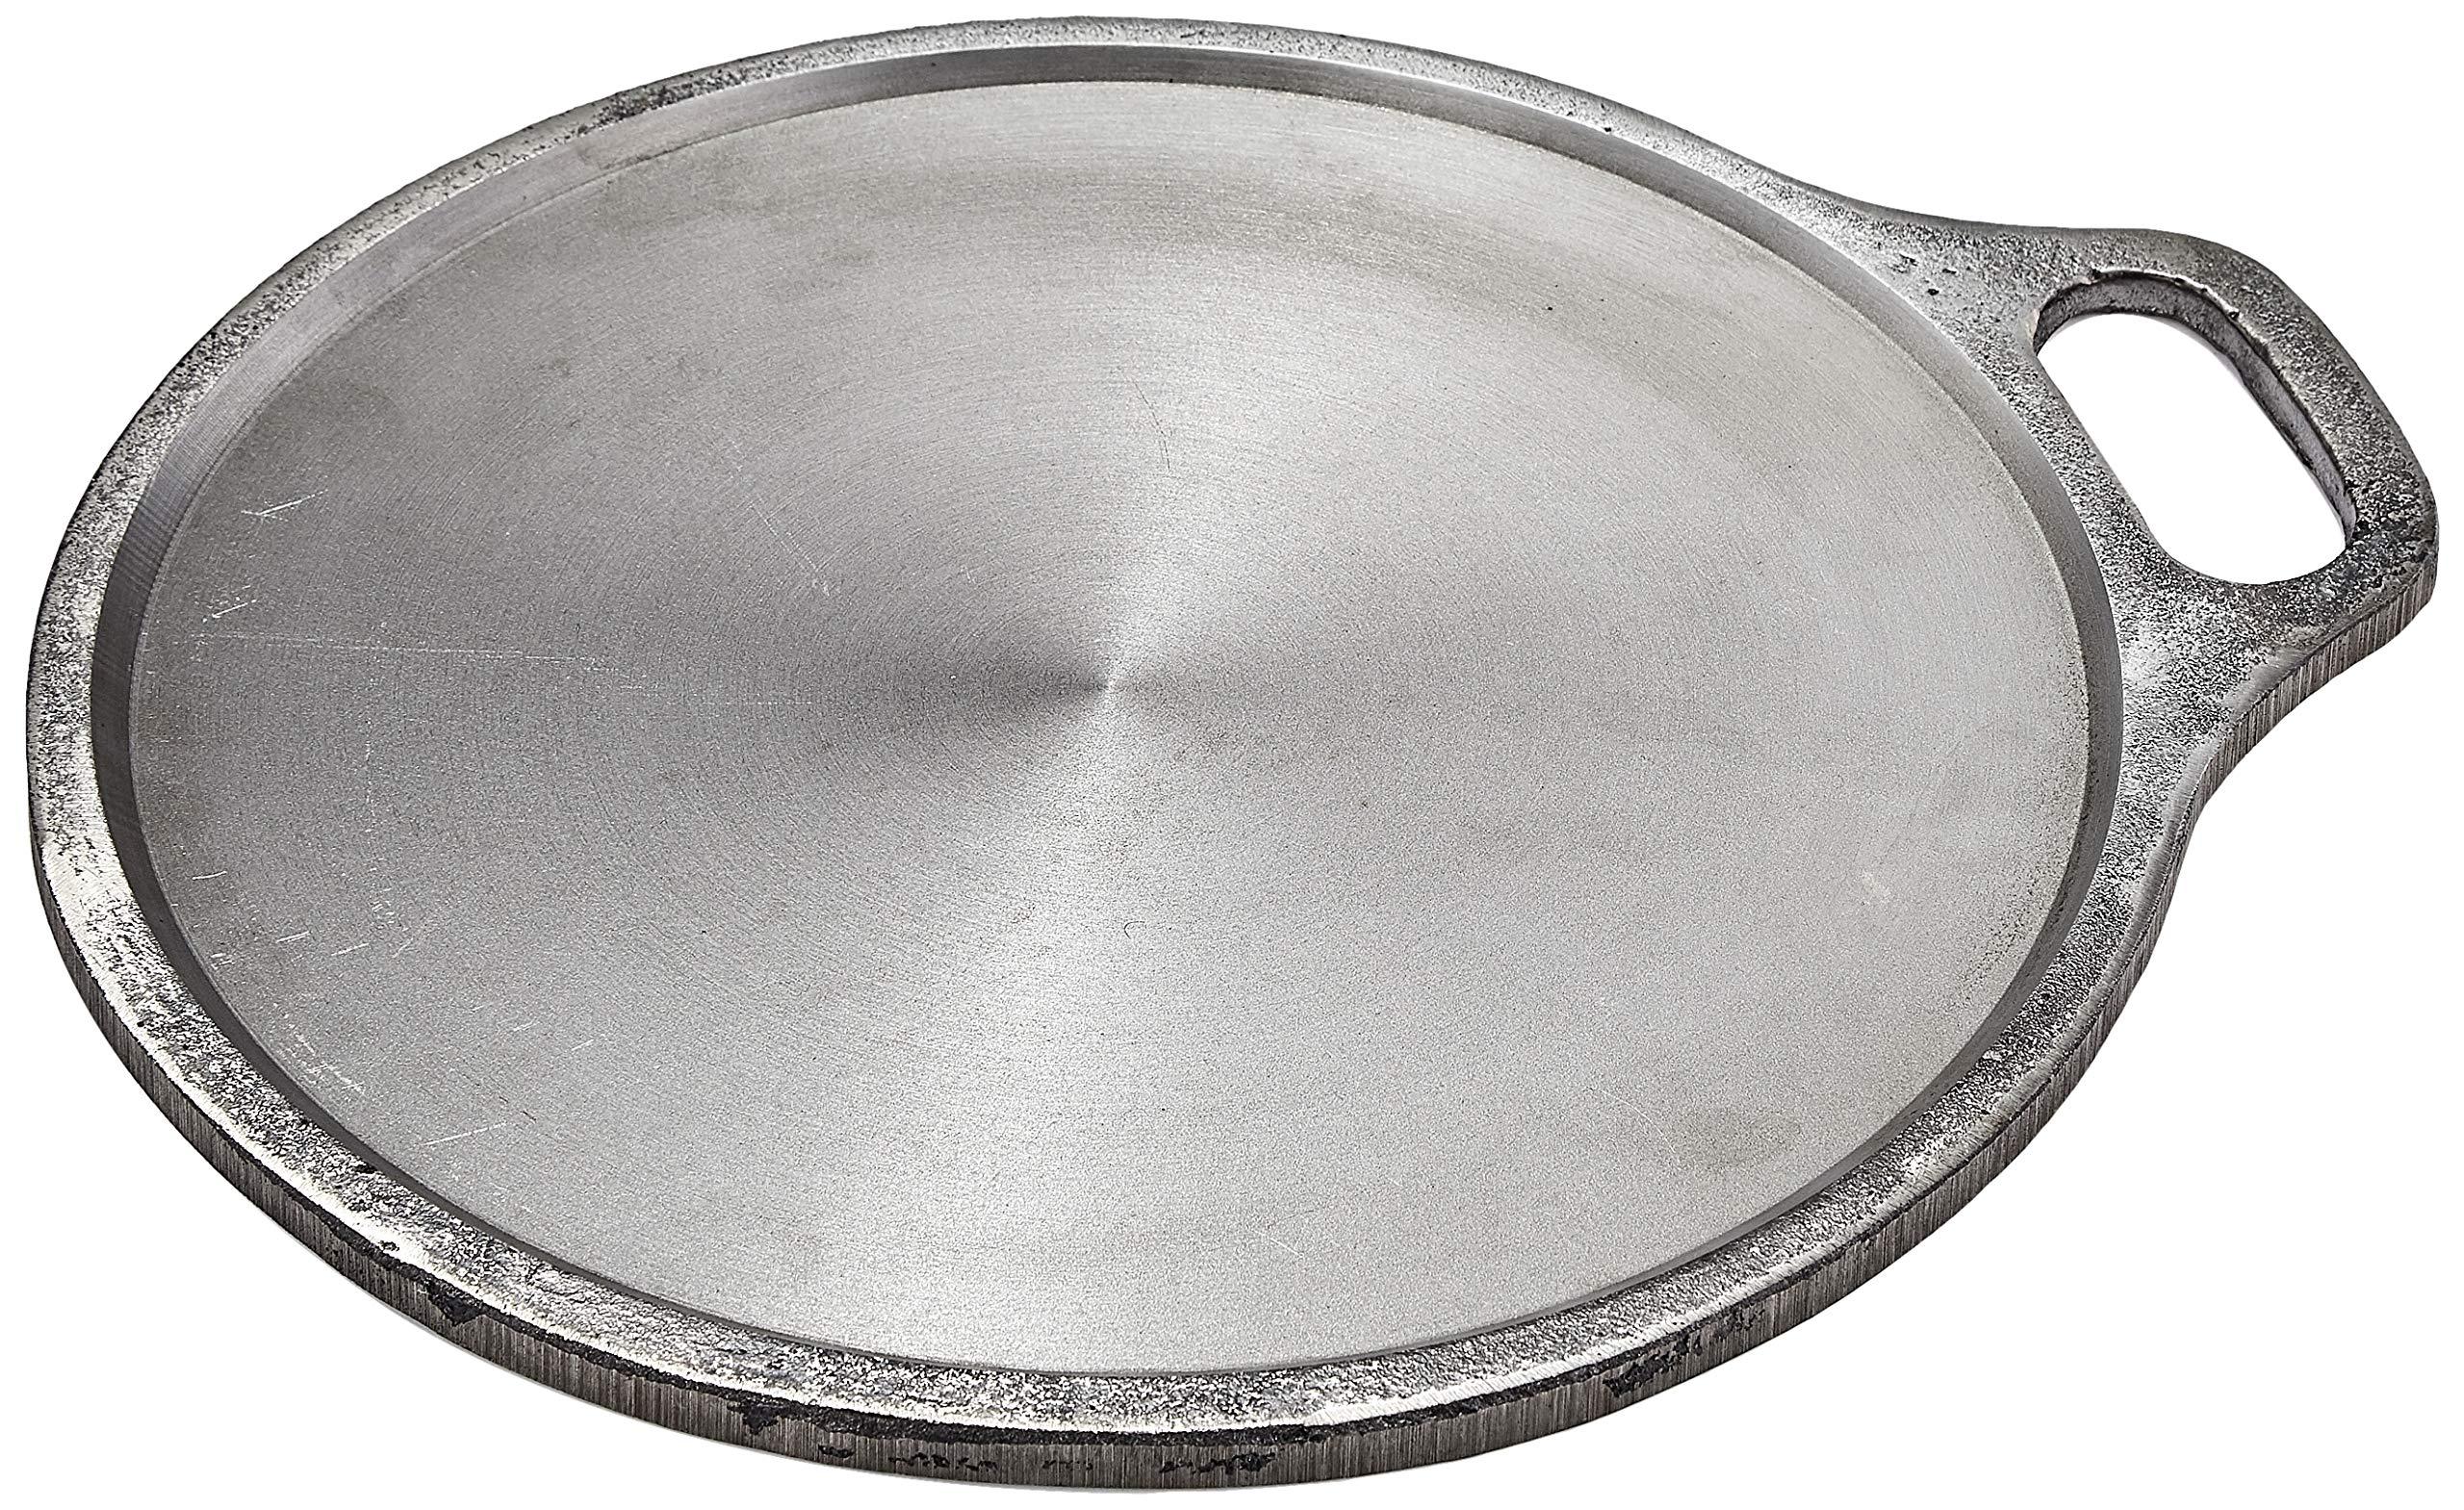 Amazon Brand - Solimo Traditional Cast Iron Dosa Tawa, 12 Inches (30 cm)